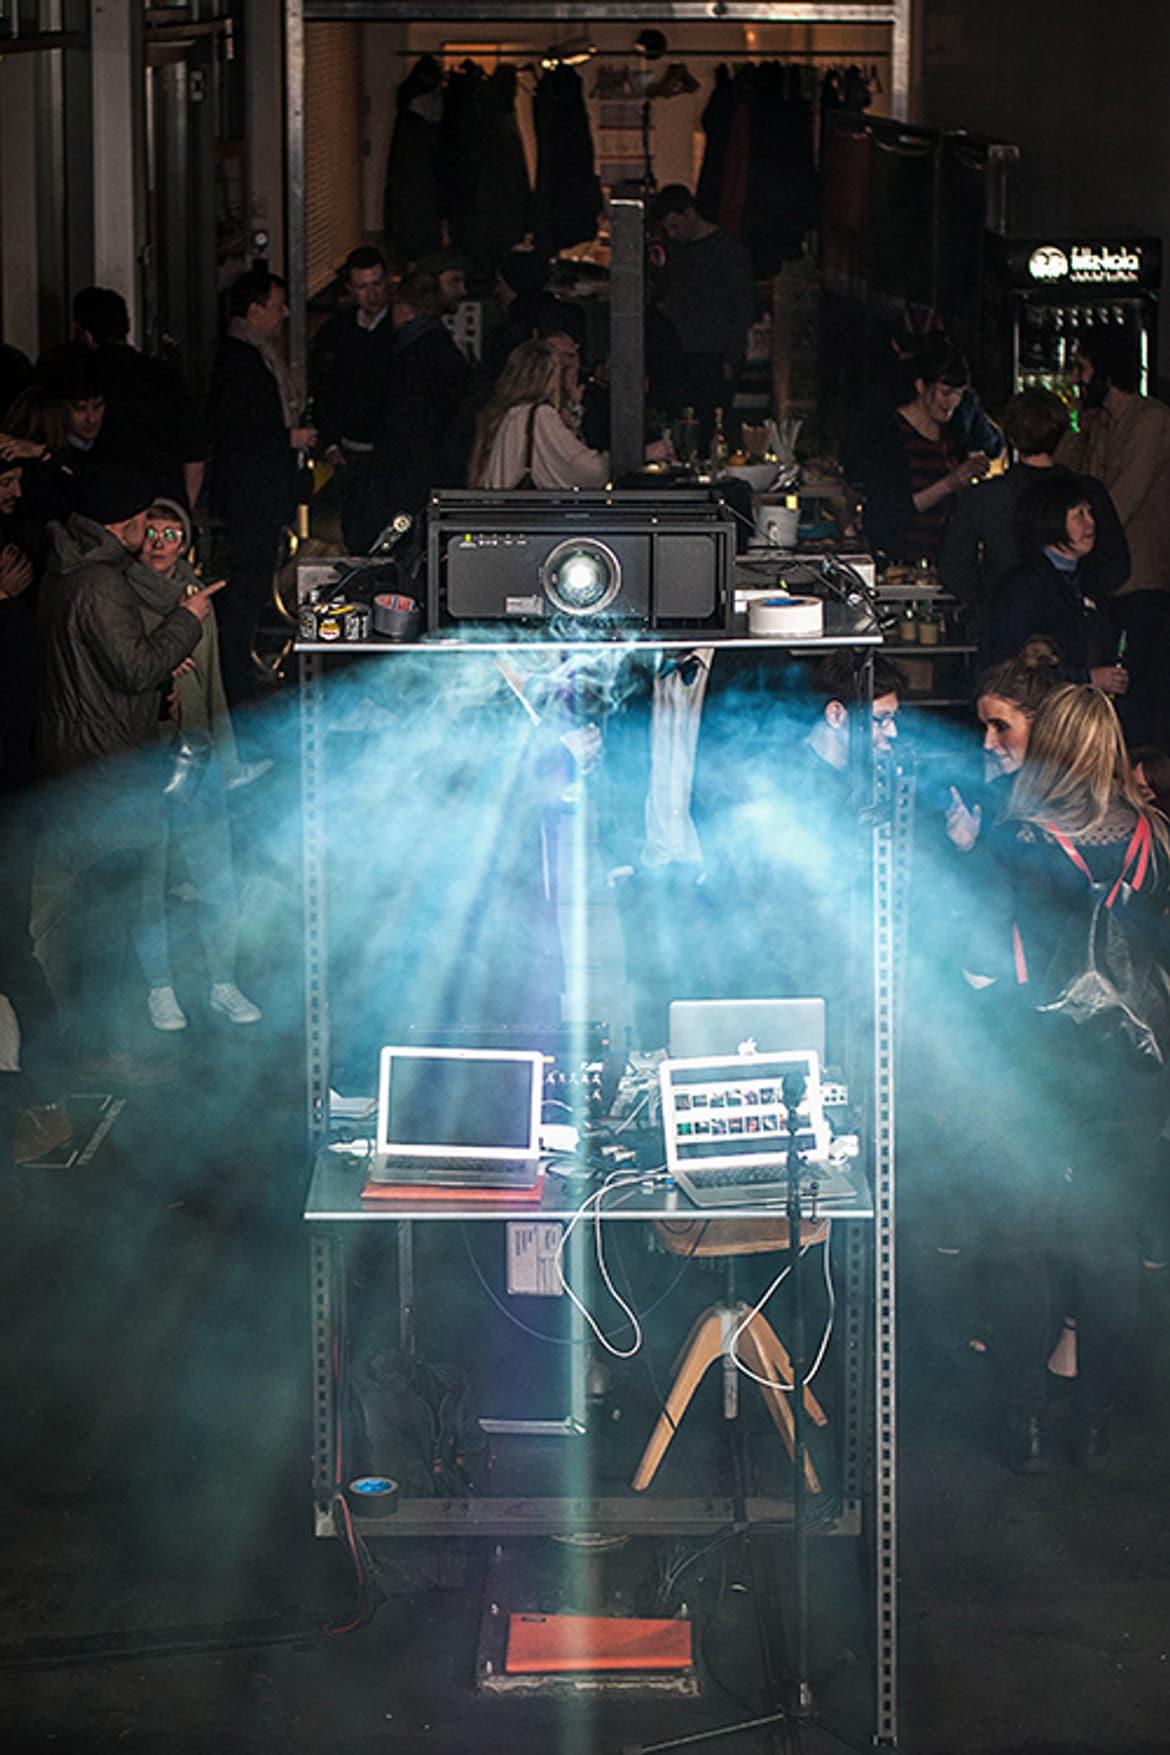 20160225_freitag_presse_event-104_gallery.jpg